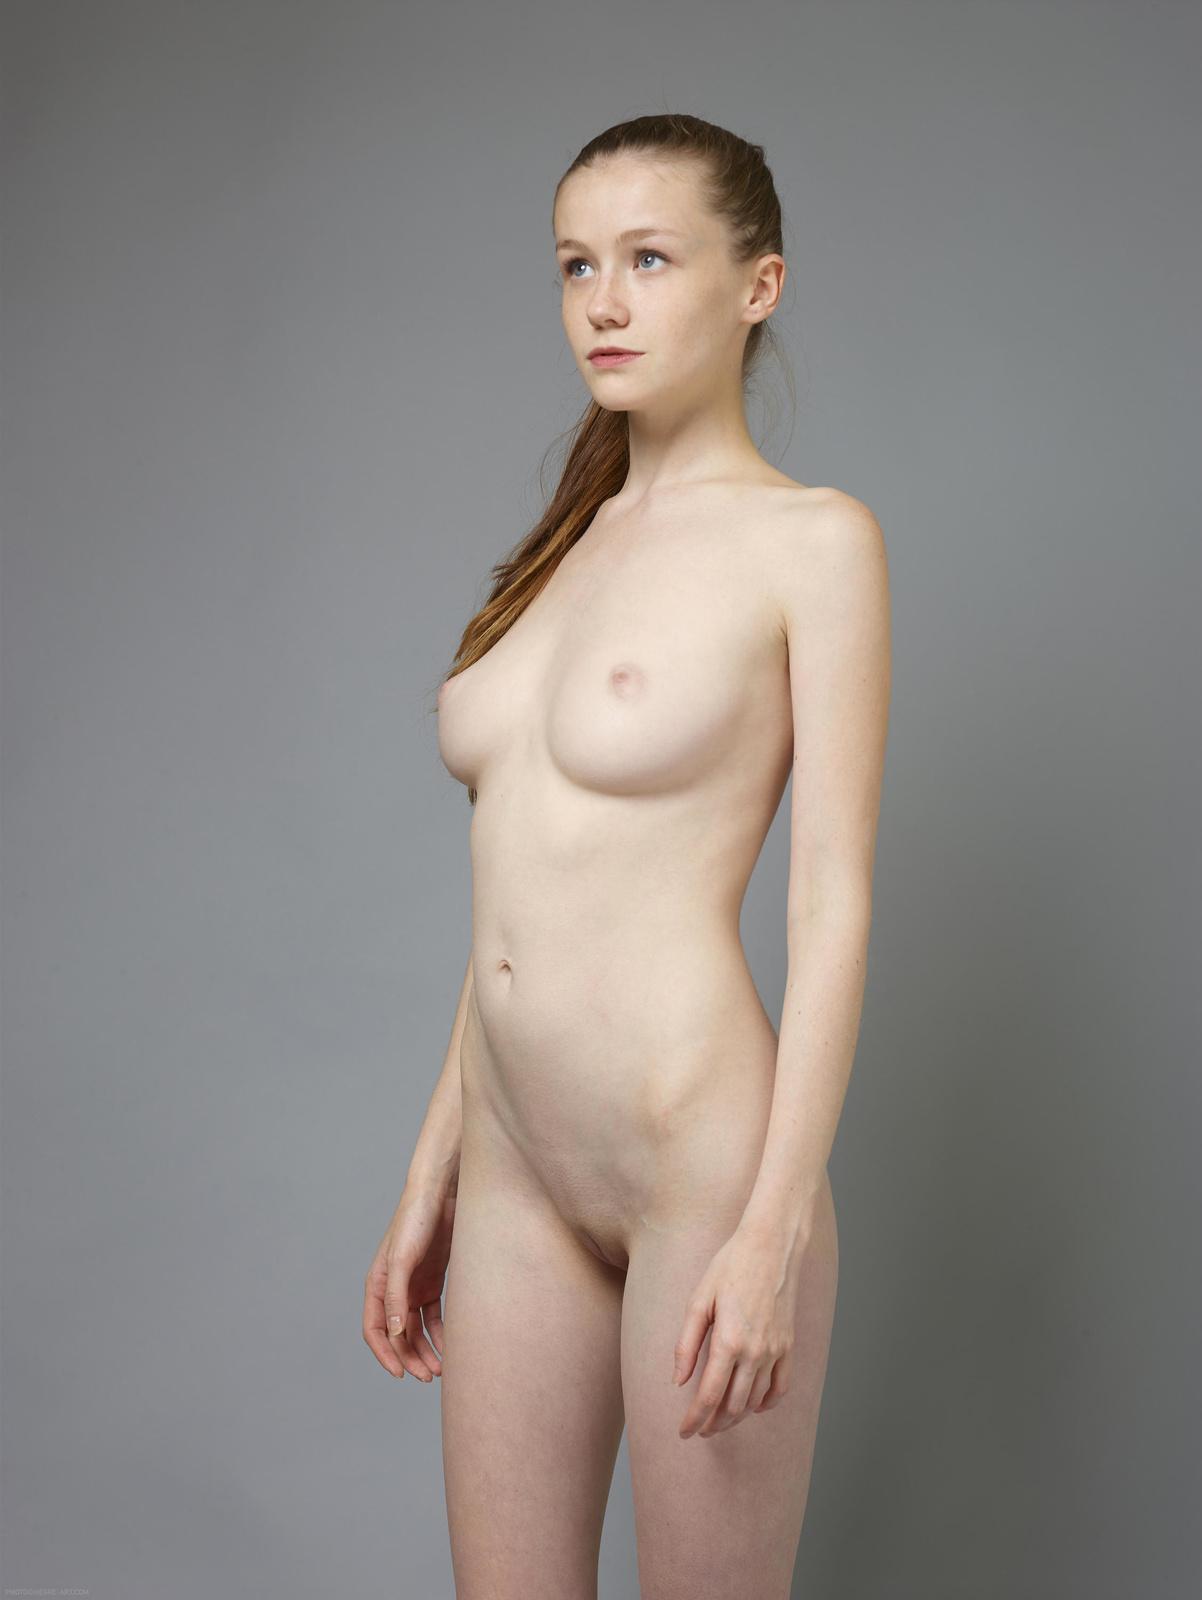 Erotic nude women photos-6865